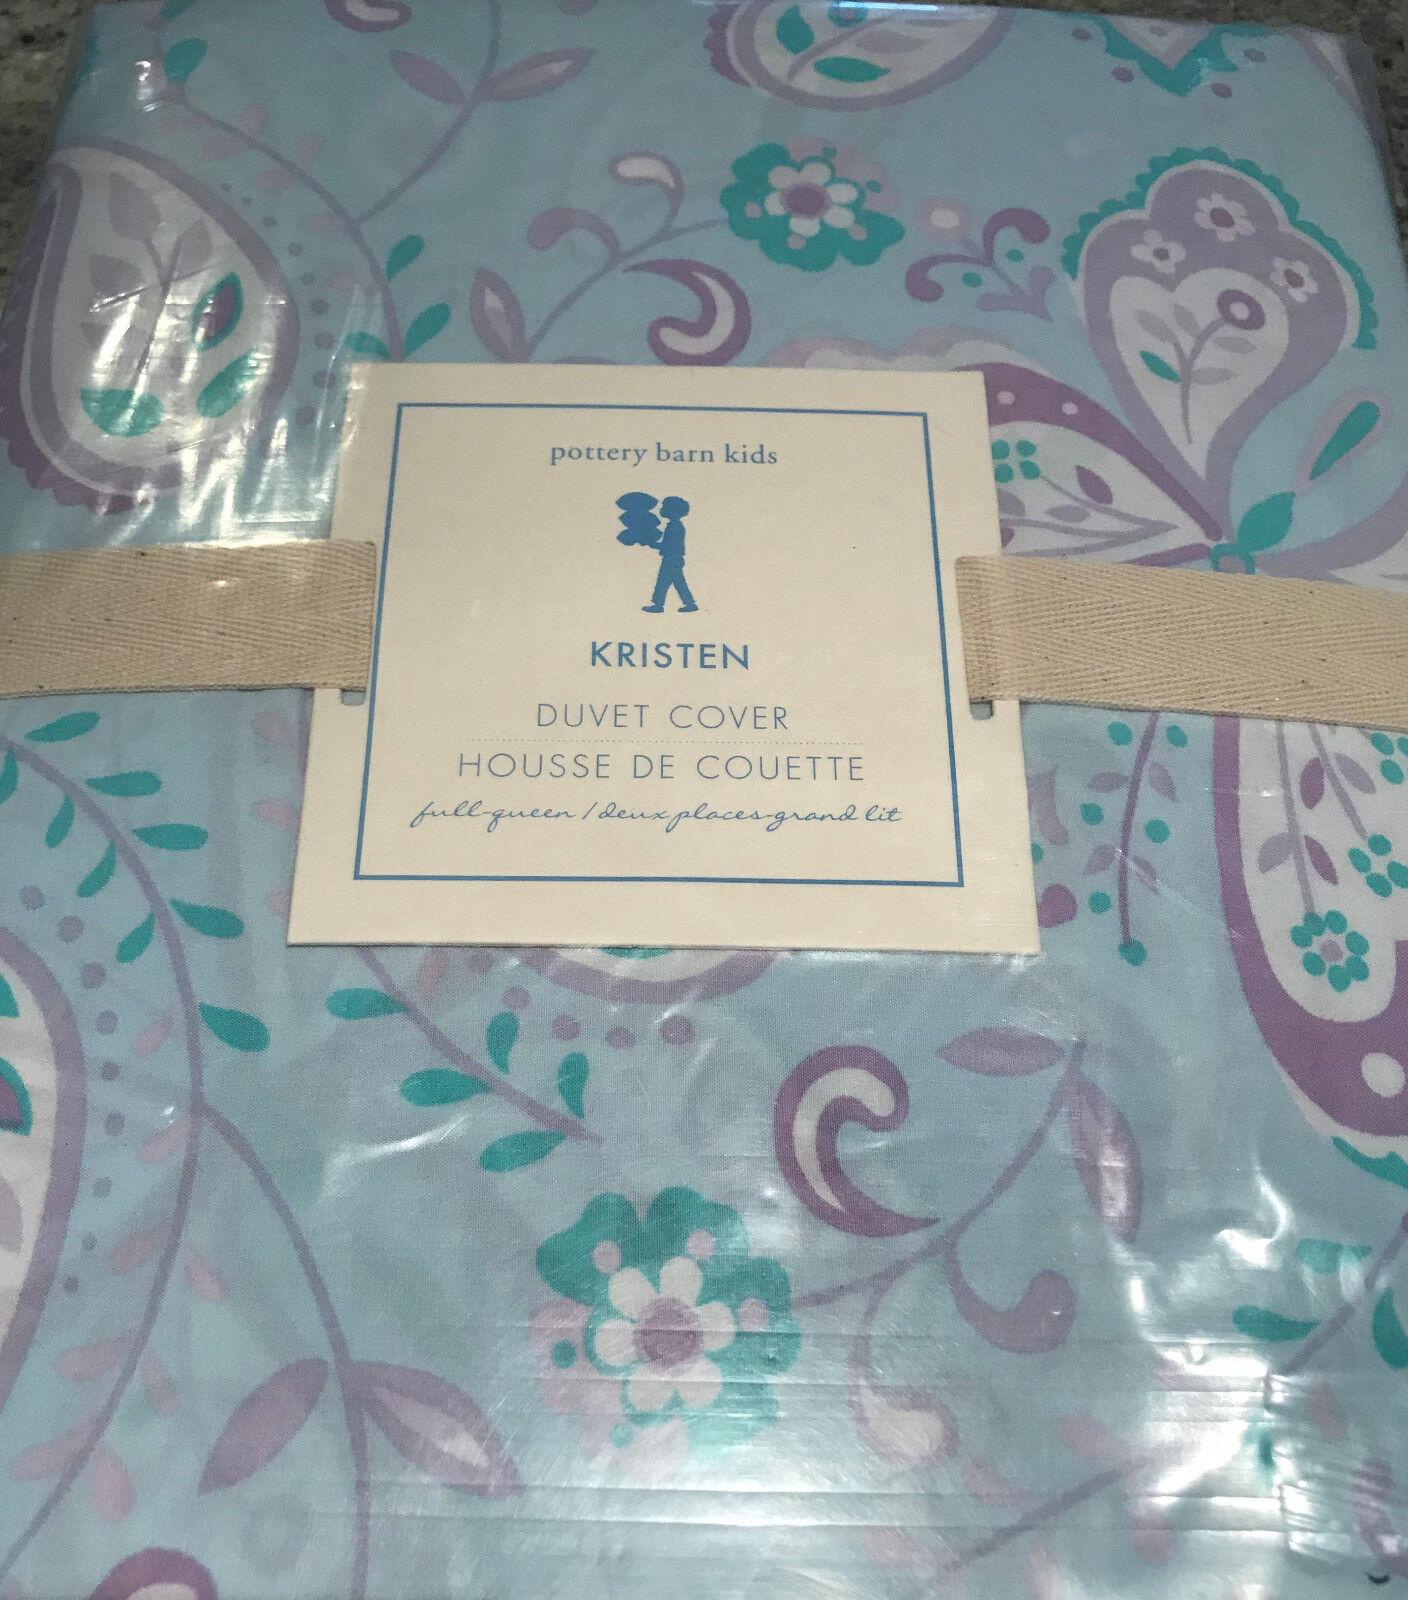 Pottery Barn Kids Kristen bleu Paisley Butterfly Full Queen F Q Duvet Cover NEW